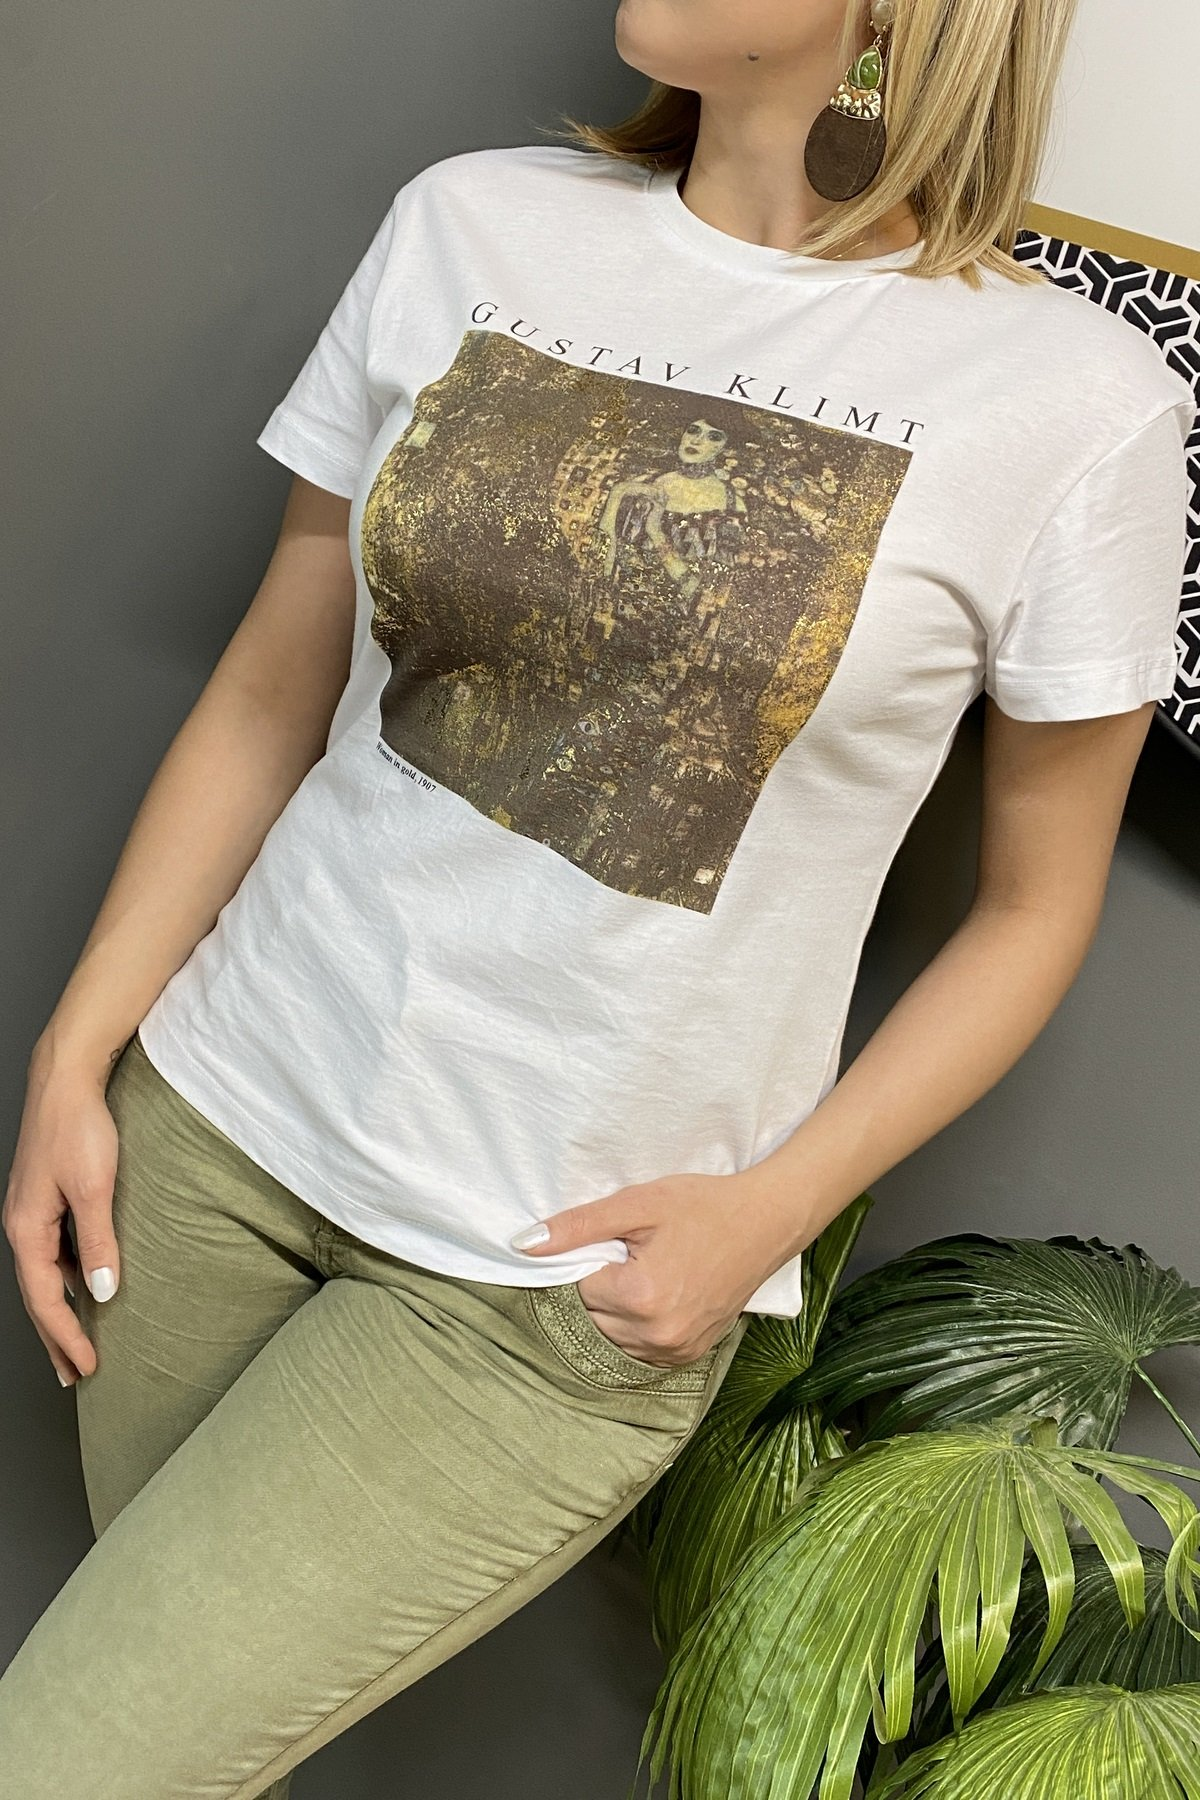 https://resim.chicbag.com.tr/p000615/byz/gustav-klimt-altinli-kadin-baskili-t-shirt-blggr-01b03df7188a.